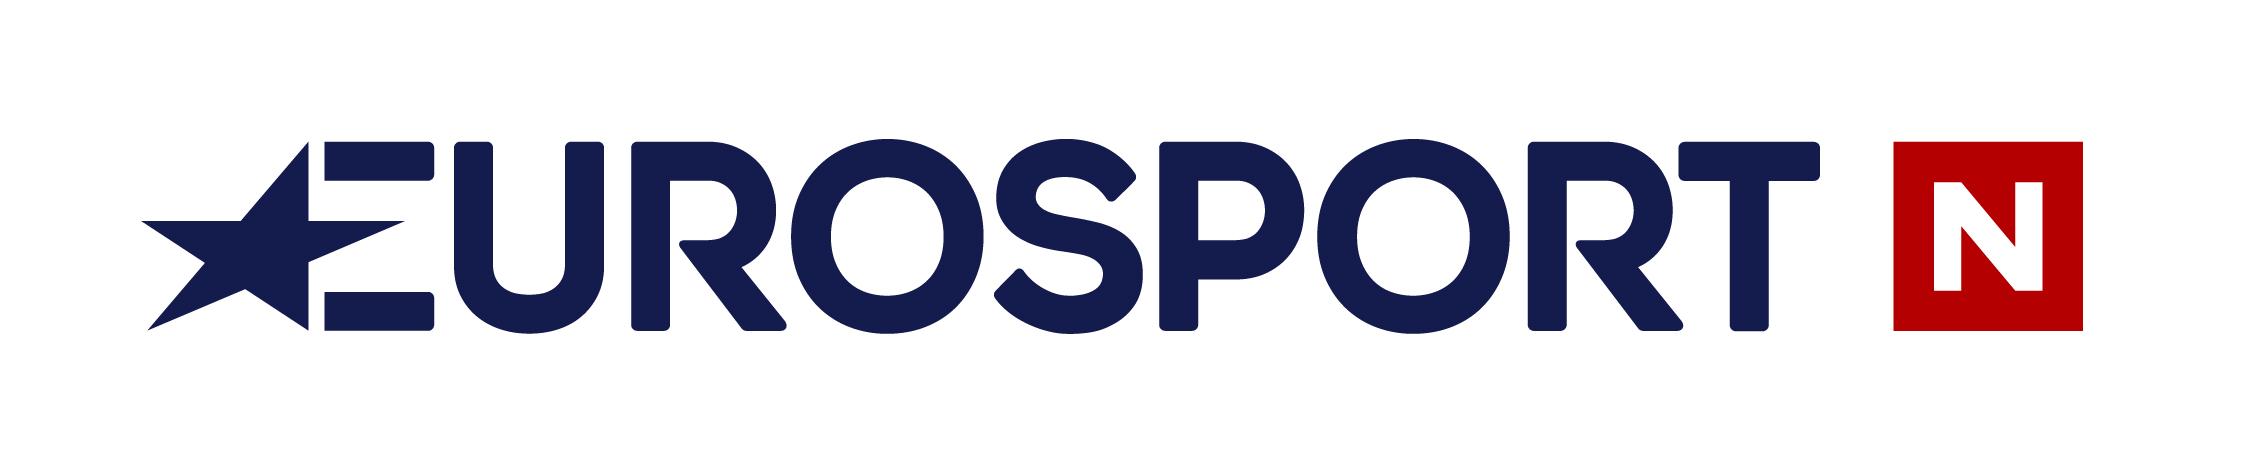 Eurosport norge